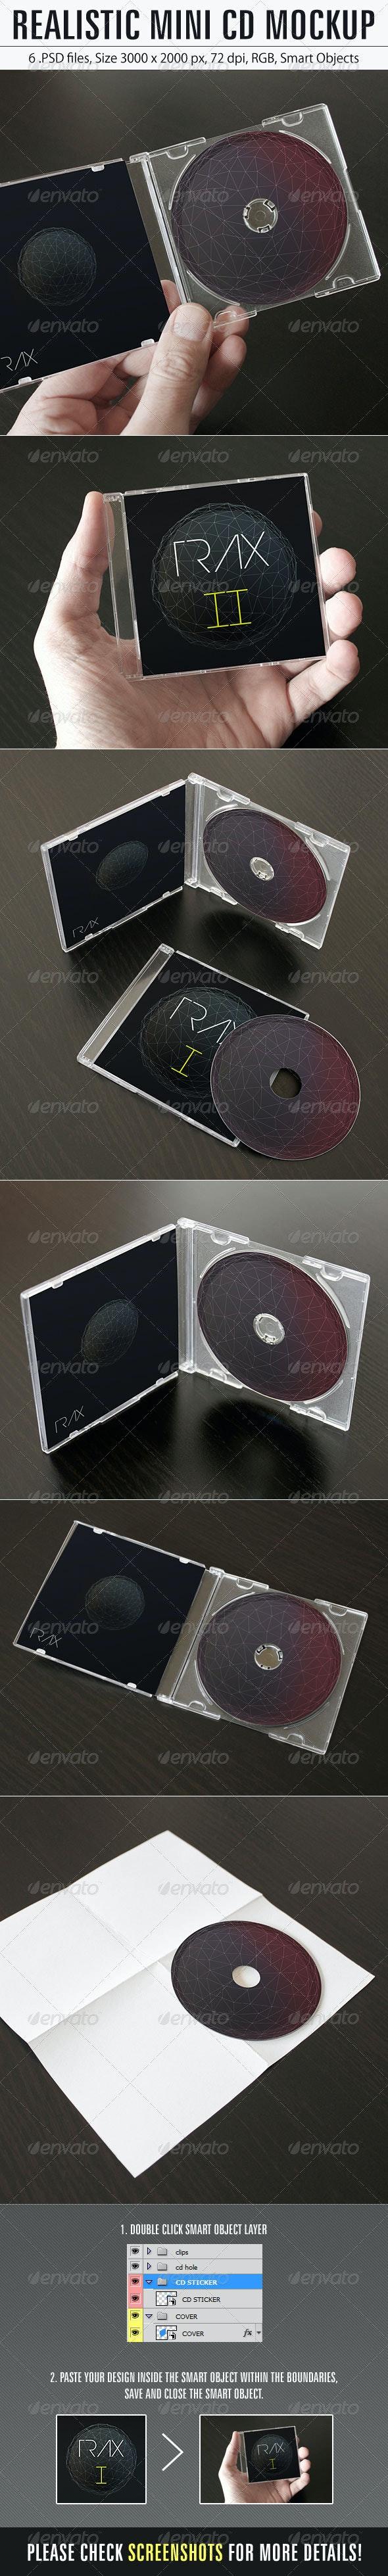 Realistic Mini CD Mockup - Product Mock-Ups Graphics